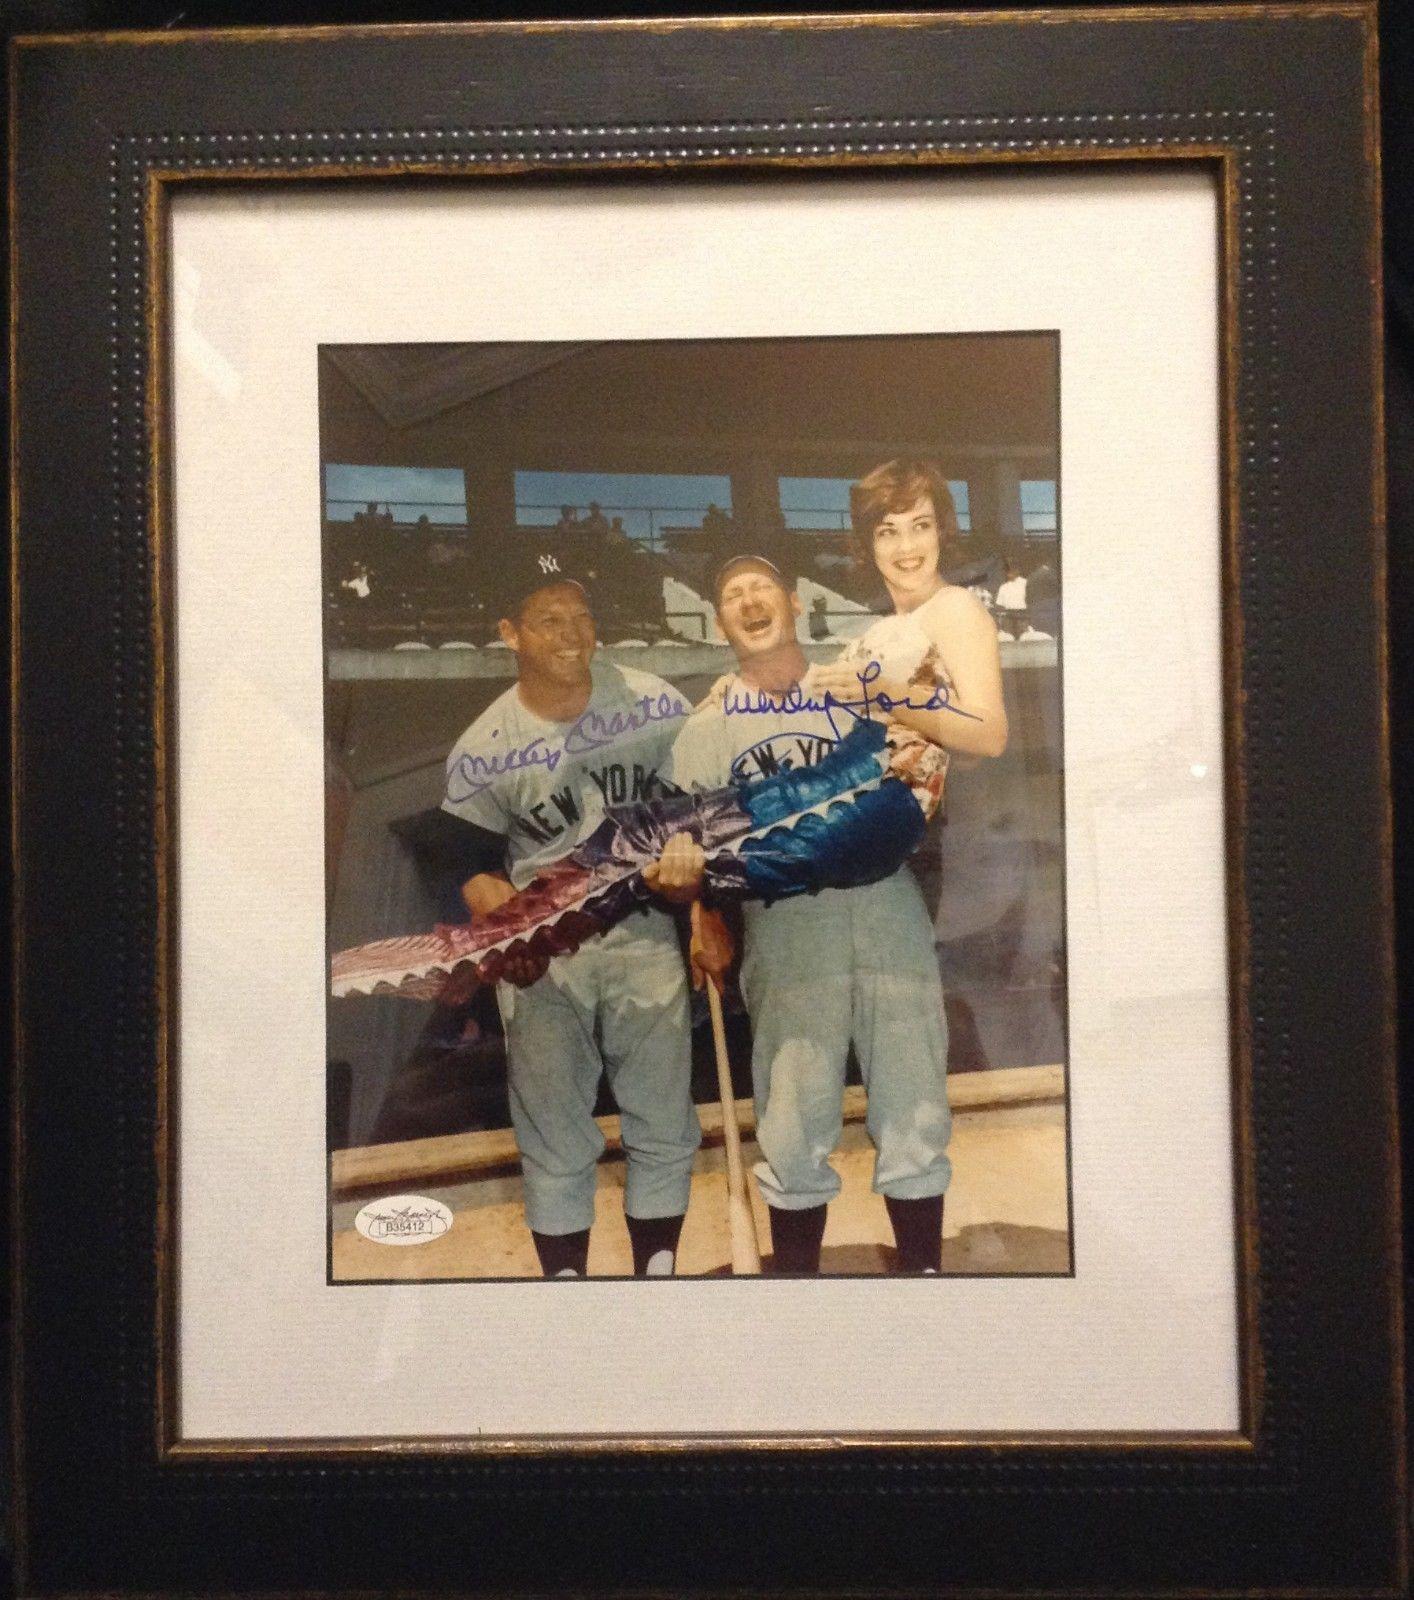 Mickey Mantle /  Whitey Ford Signed Mermaid 8×10 Framed Photo autograph JSA COA